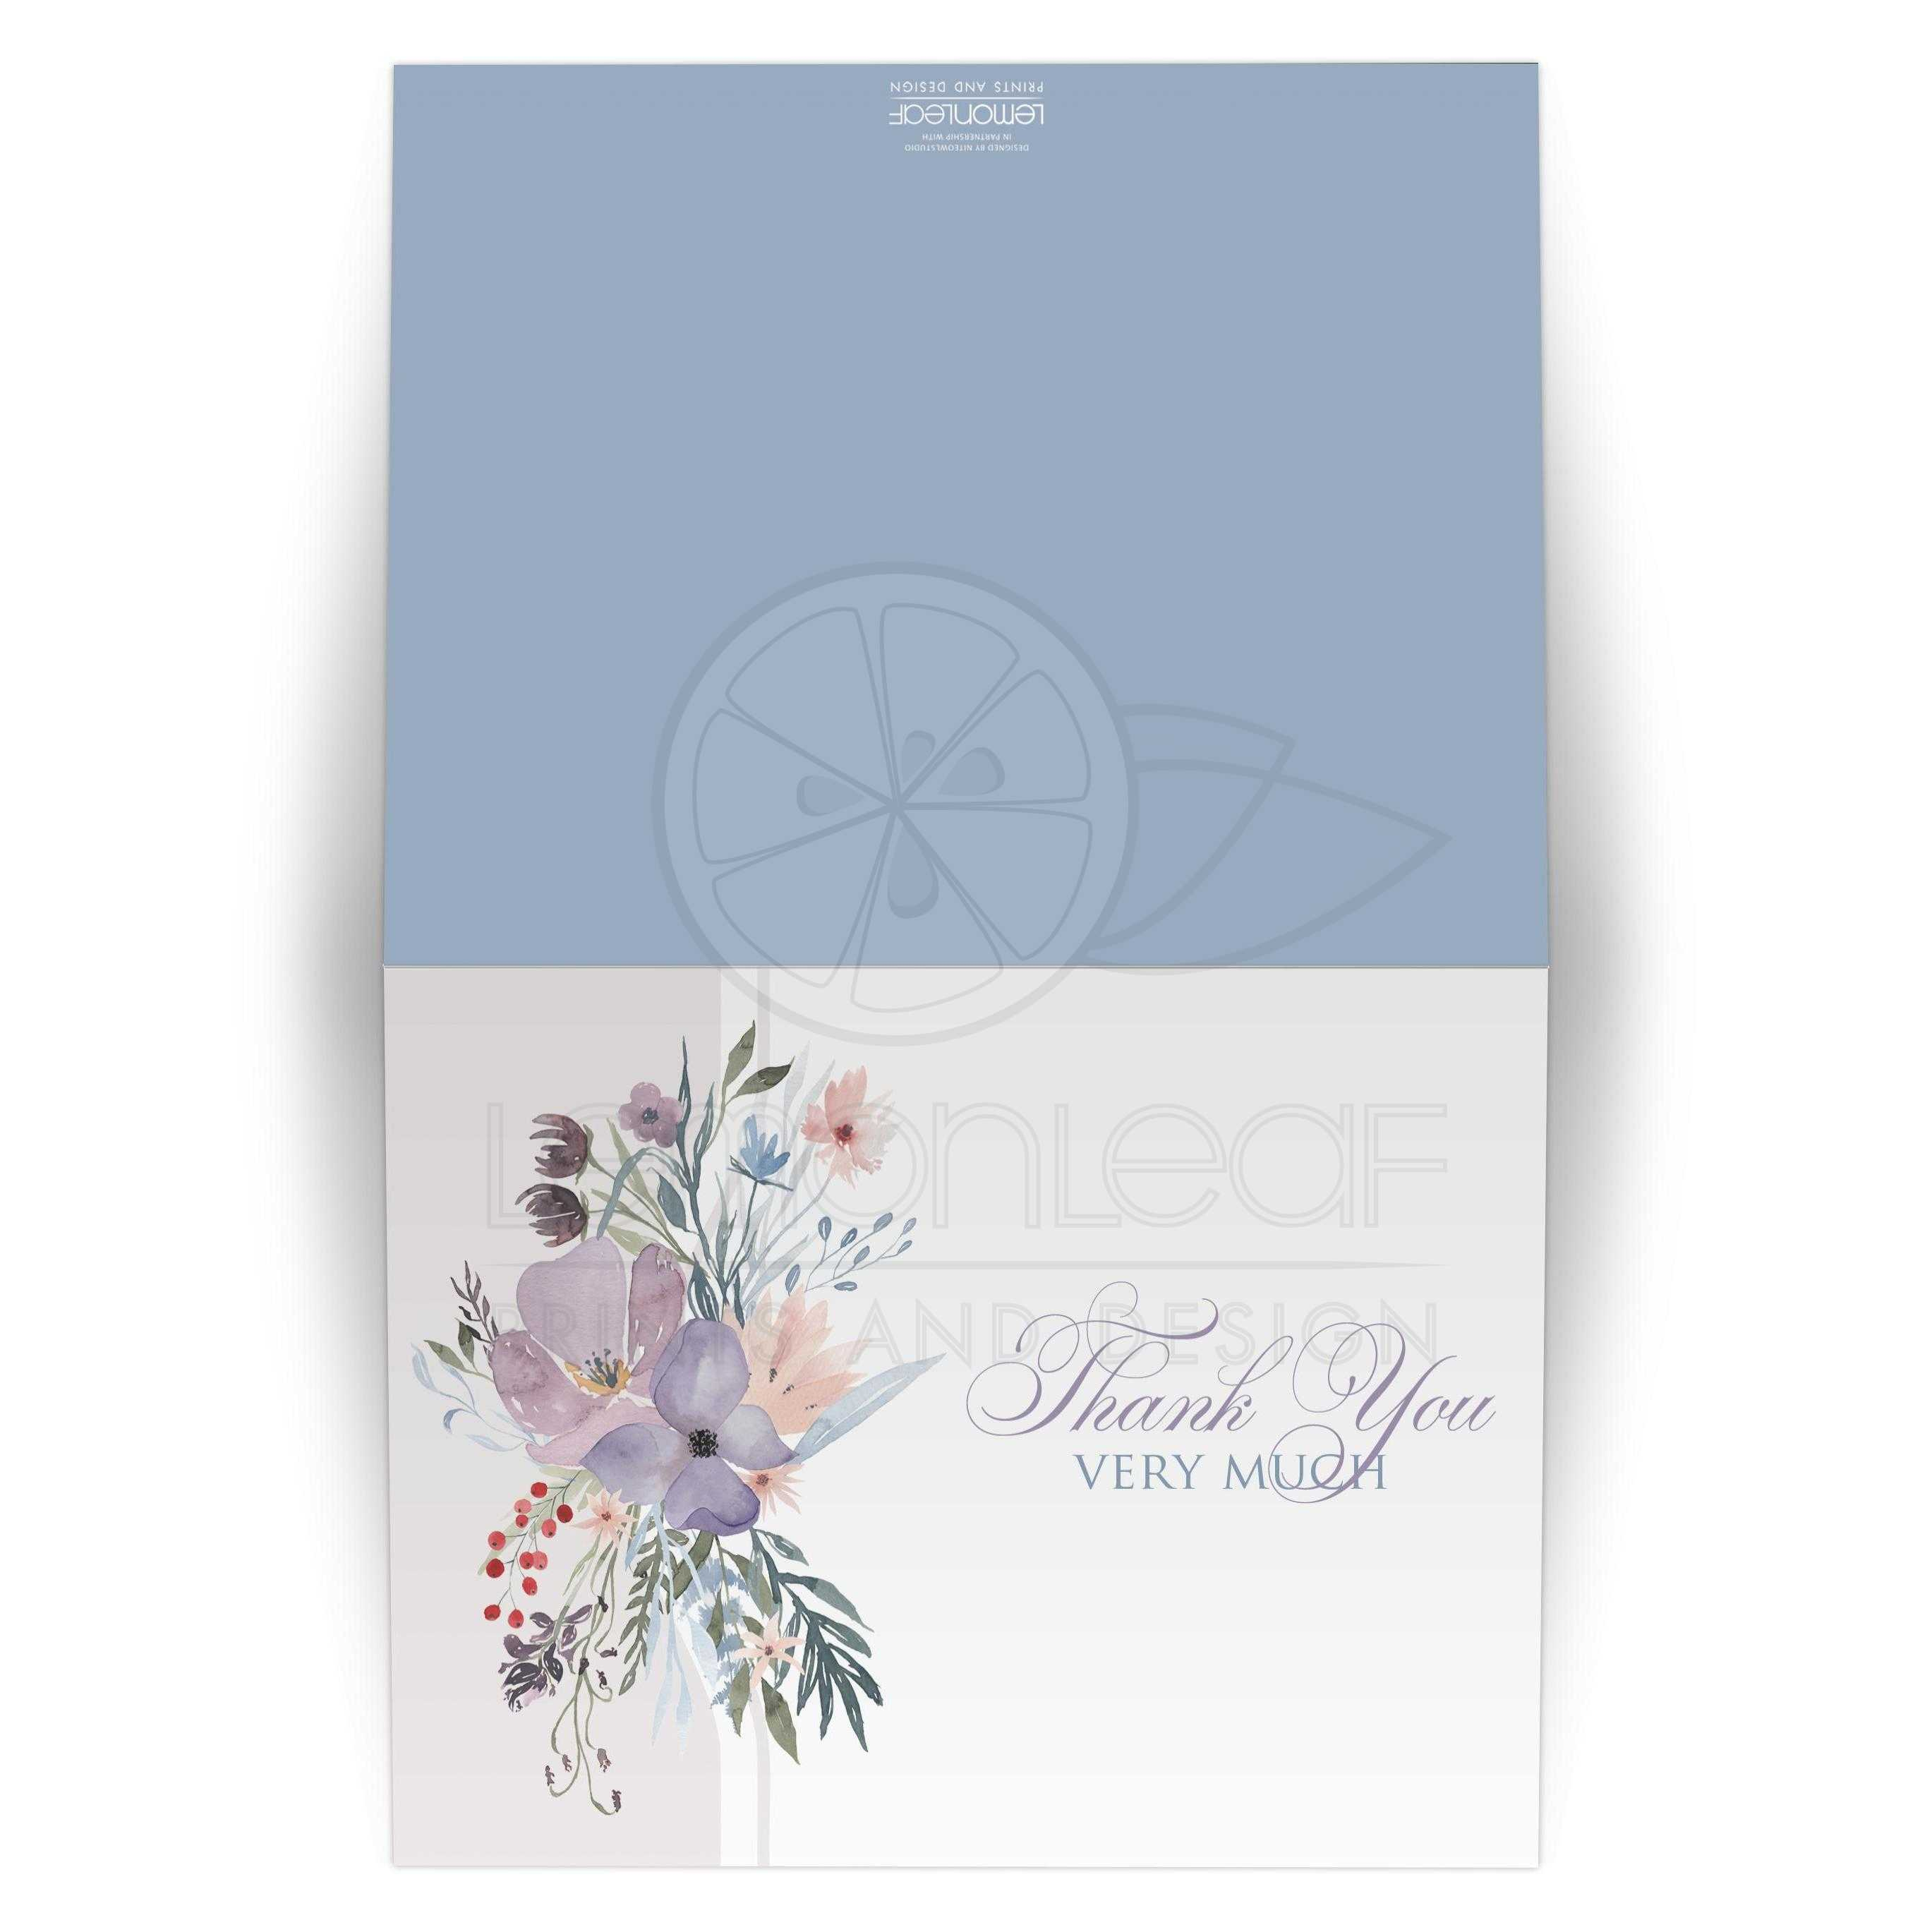 bohemian wildflowers thank you card blank smoky blue plum